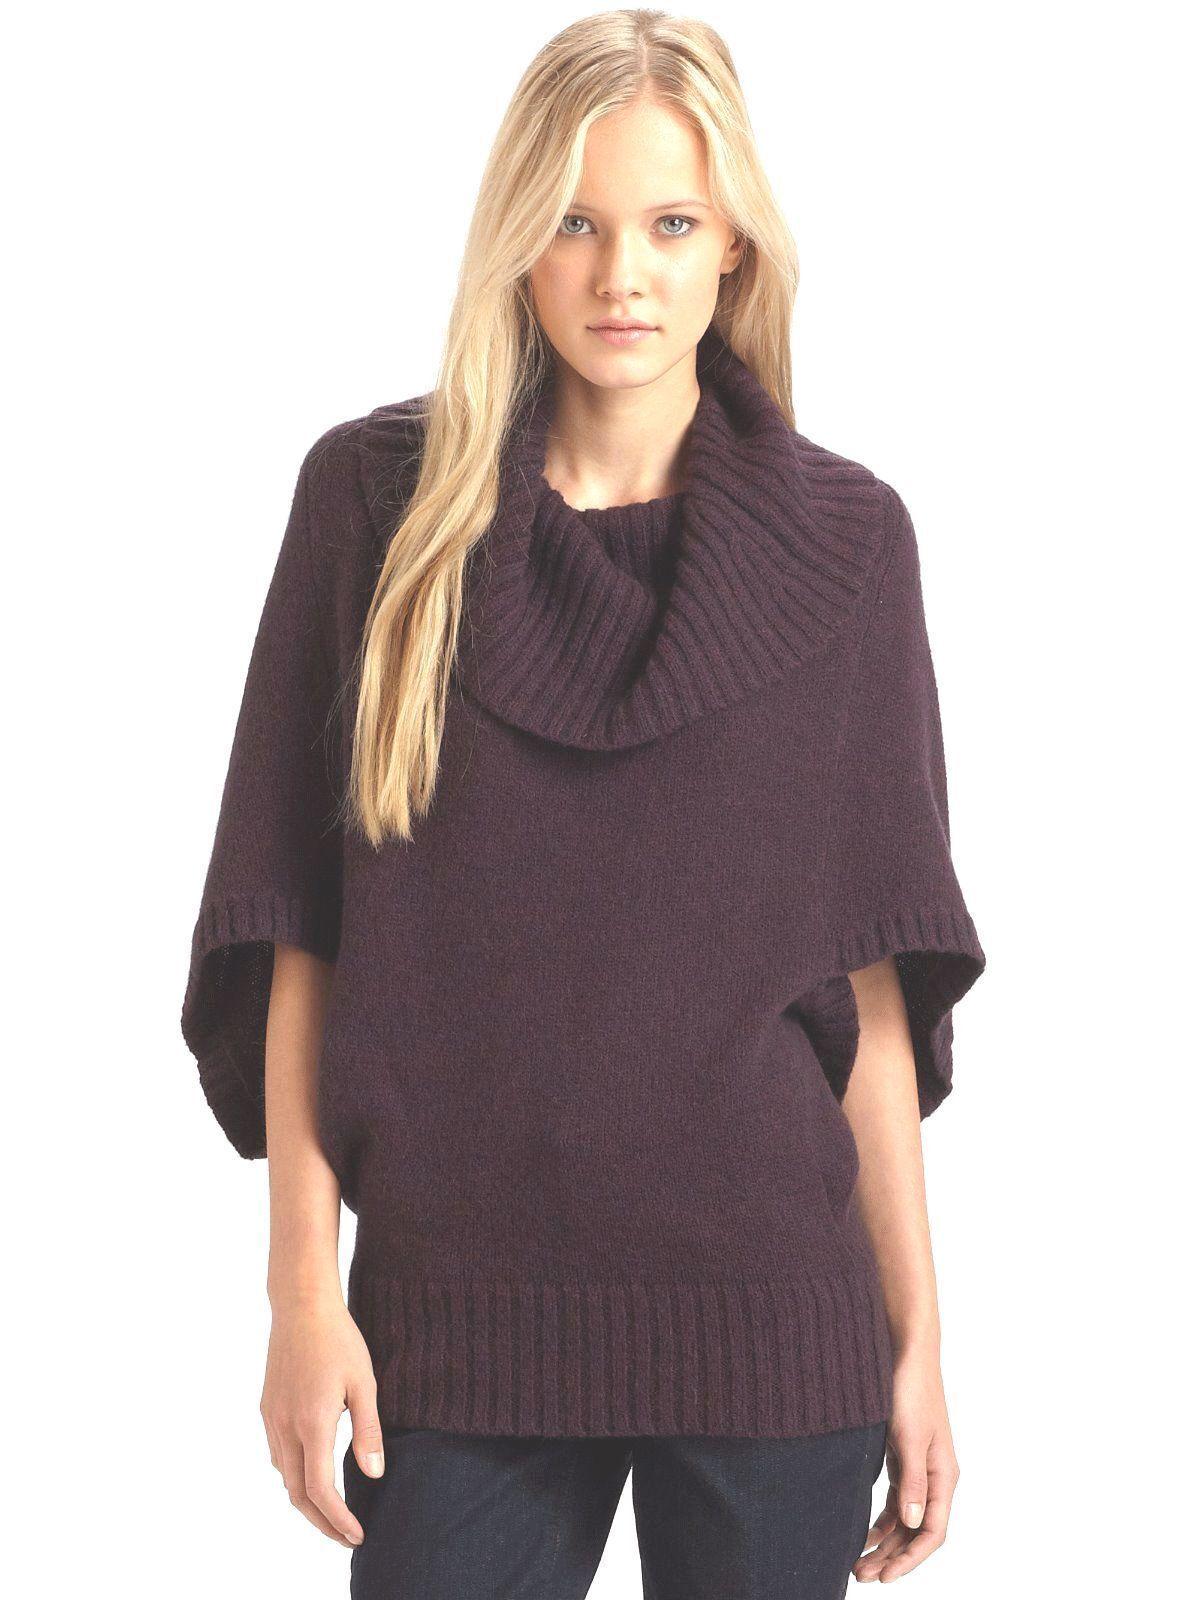 398 BNWT Eileen Fisher Merino bebis Camel DRK POMEGRANATE Cocoon tröja XL